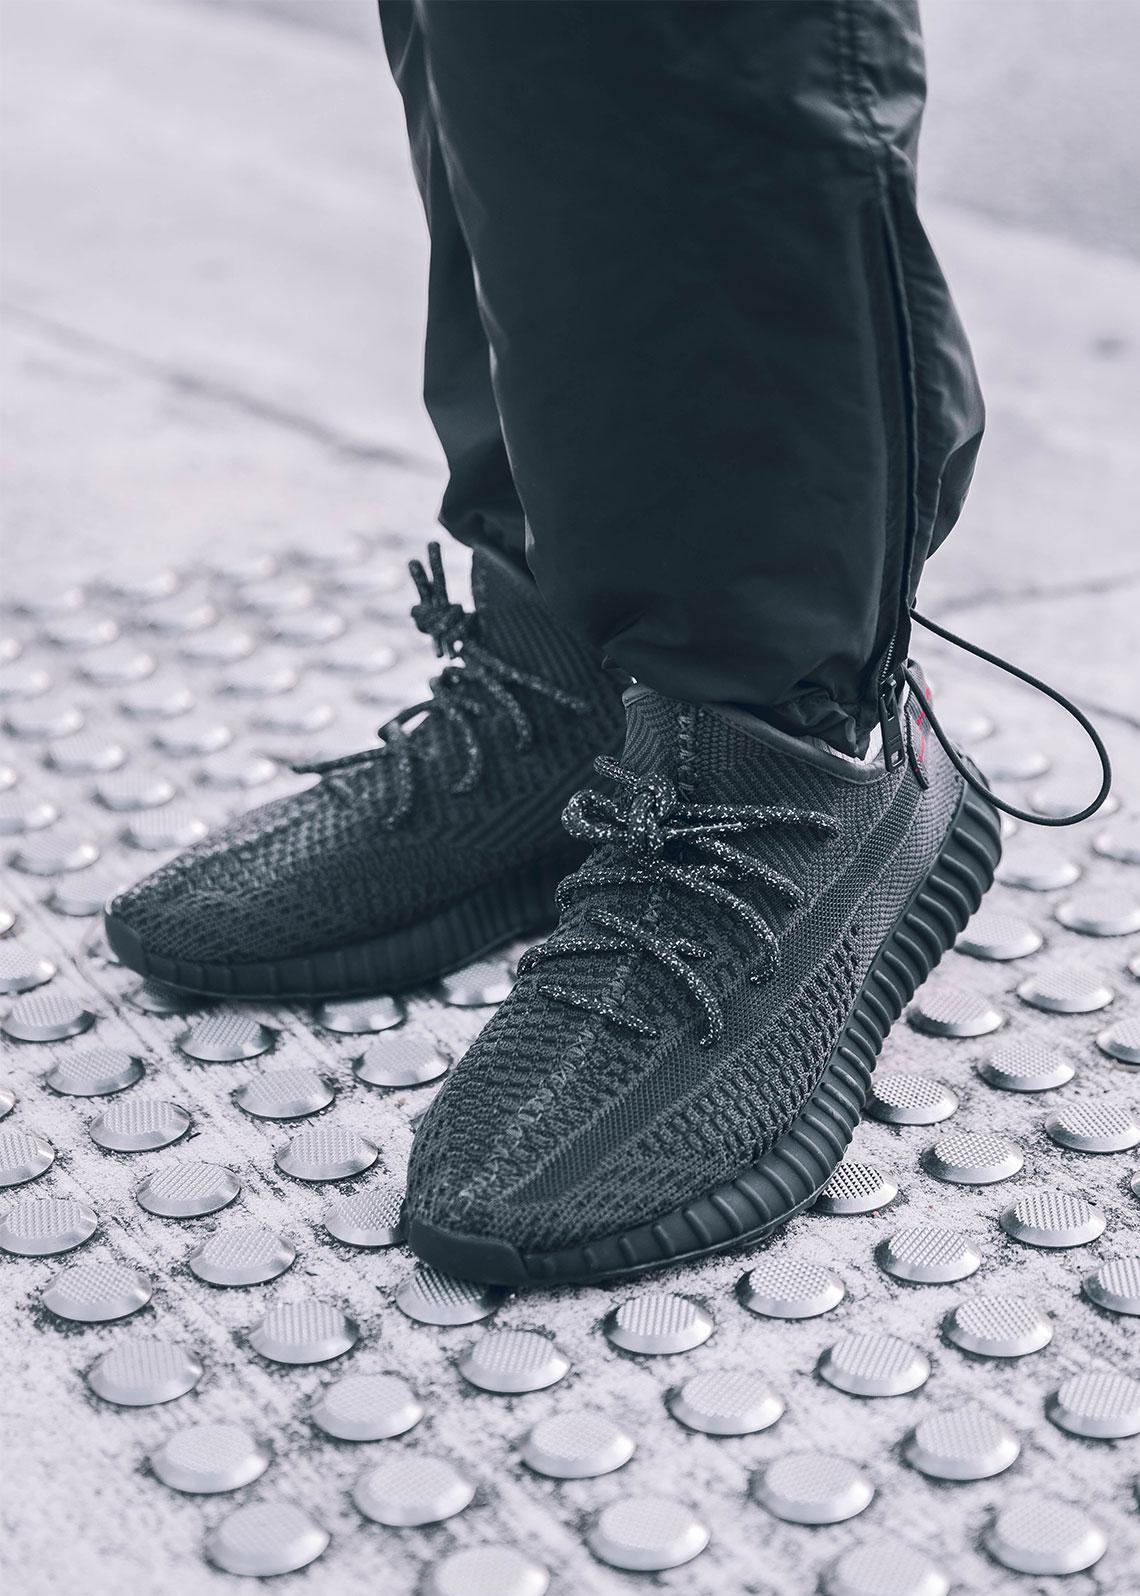 adidas Yeezy Boost 350 v2 Black FU9013 Release Date   SneakerNews.com